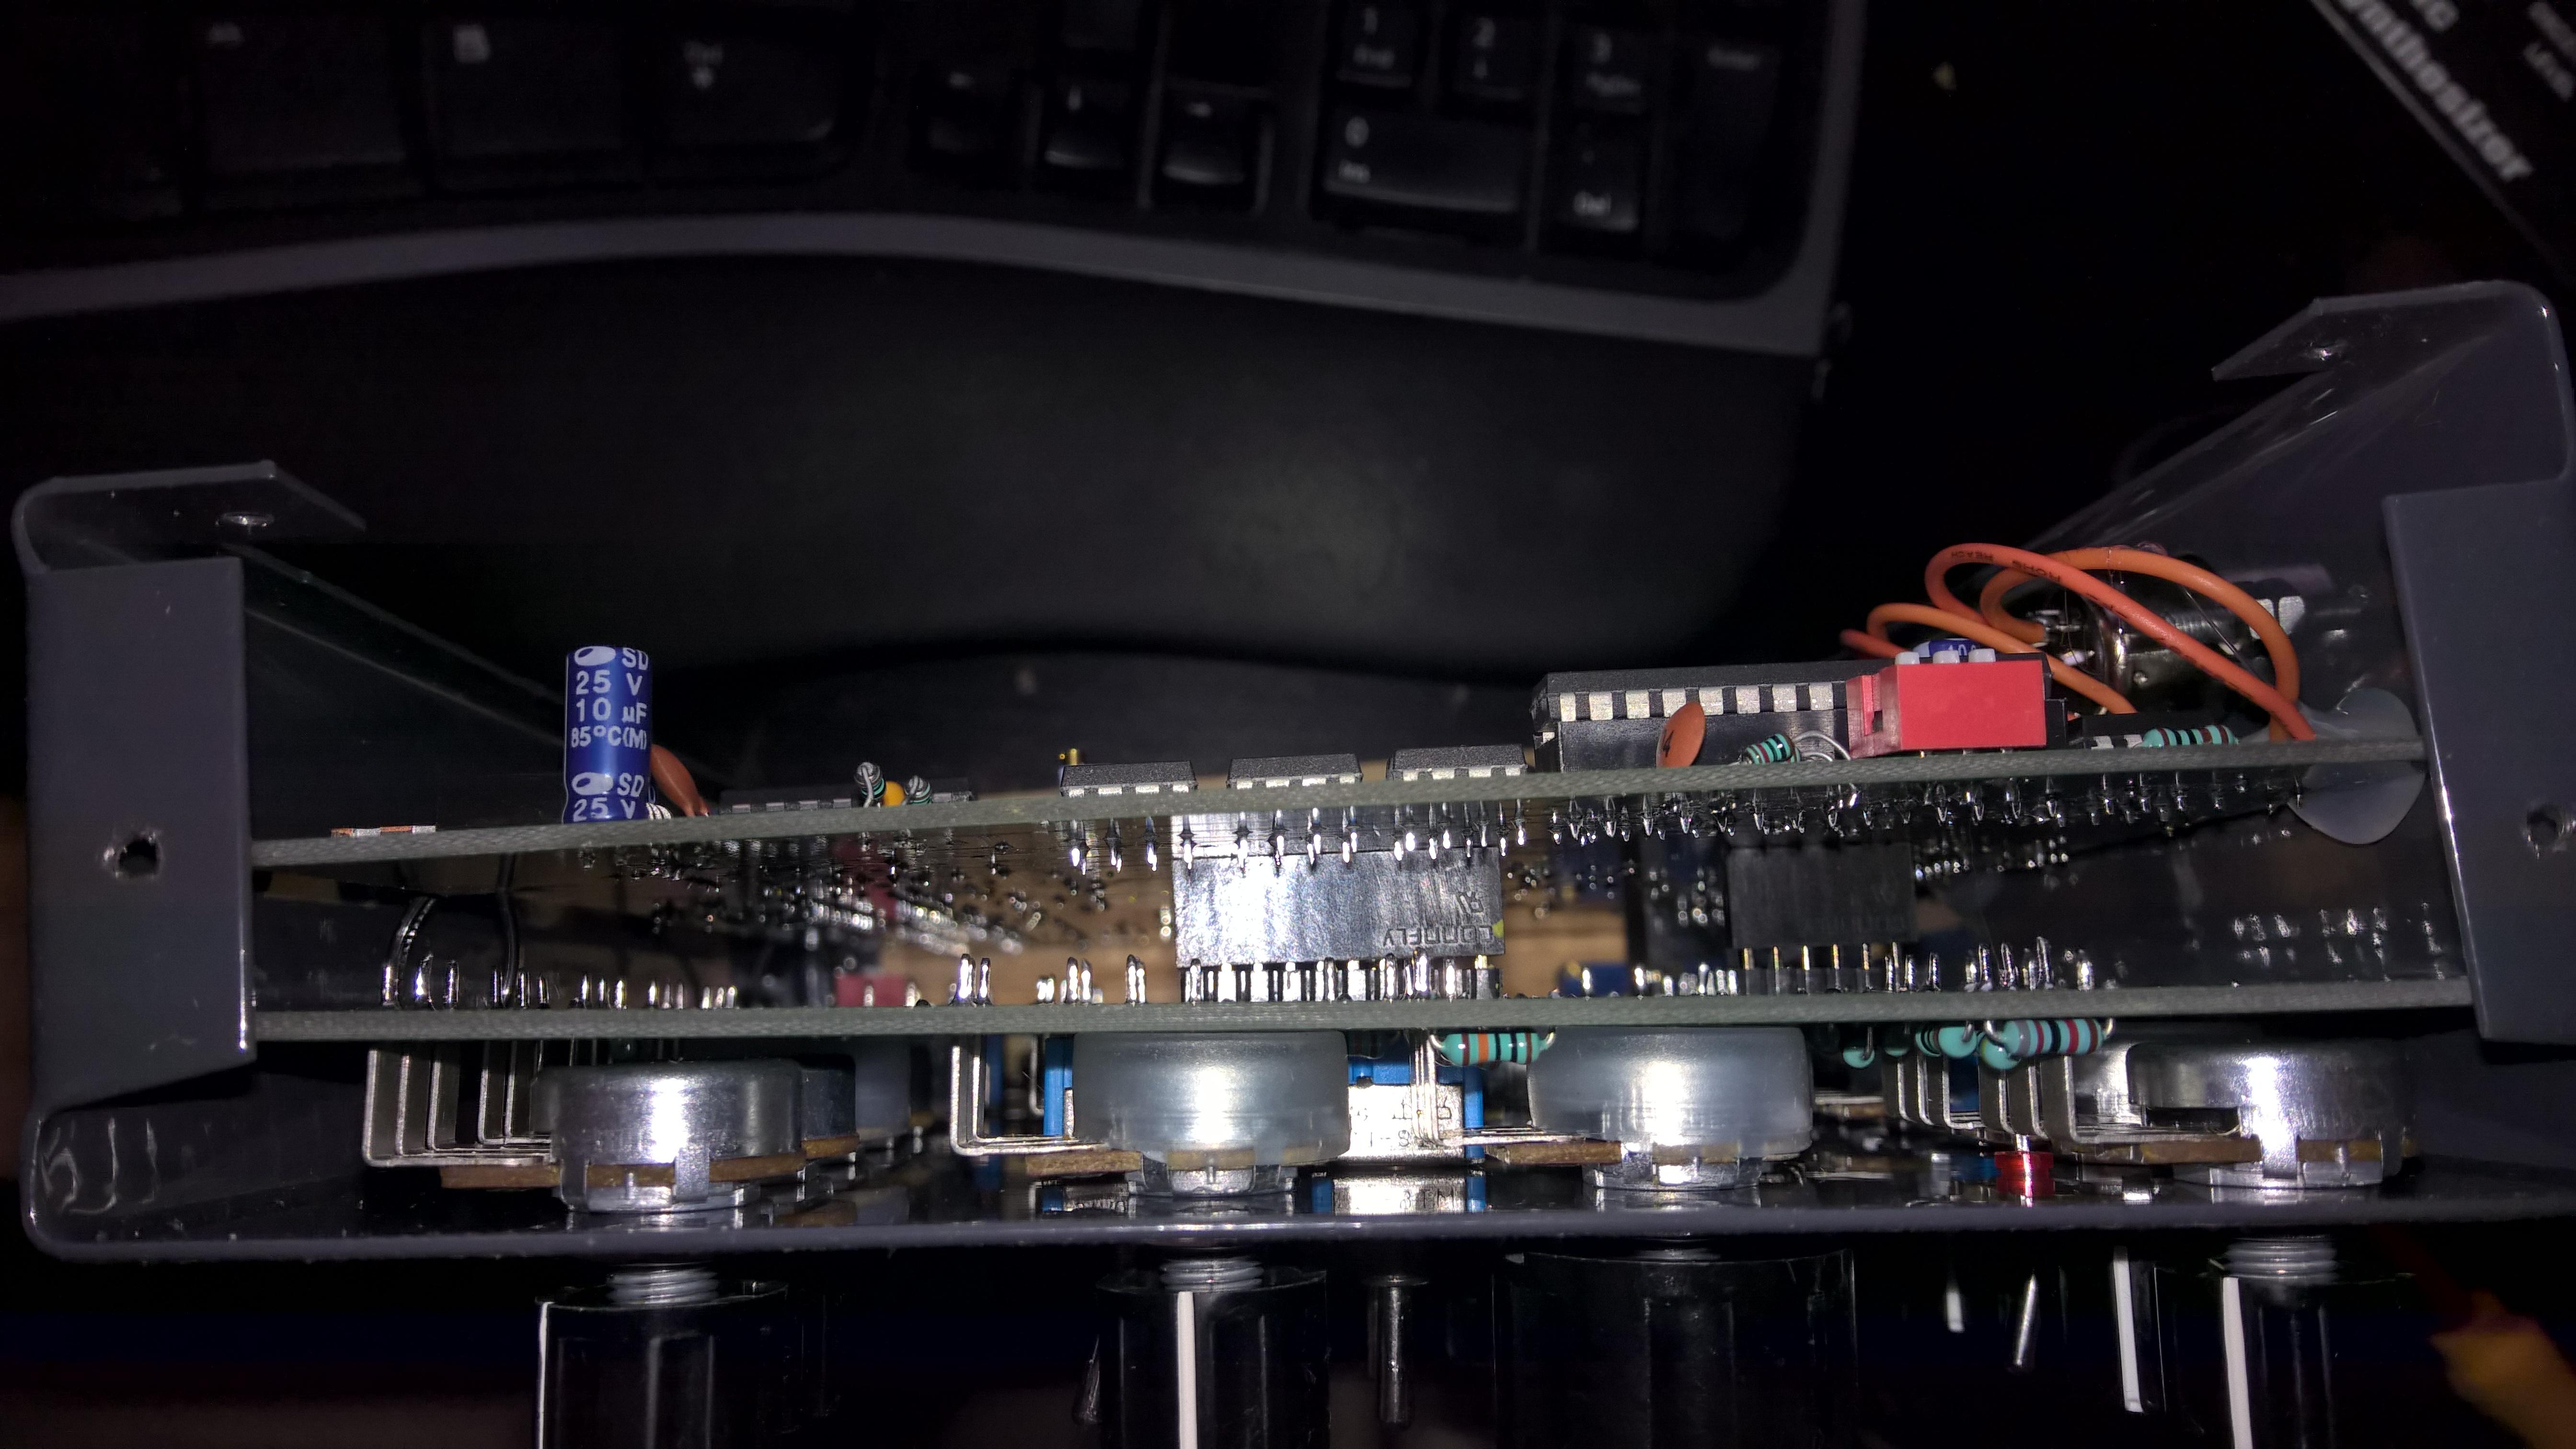 Filedreadbox Erebus Analog Paraphonic Synthesizer Teardown Left Electronics Technology 02 08 12 Current 0231 June 2015